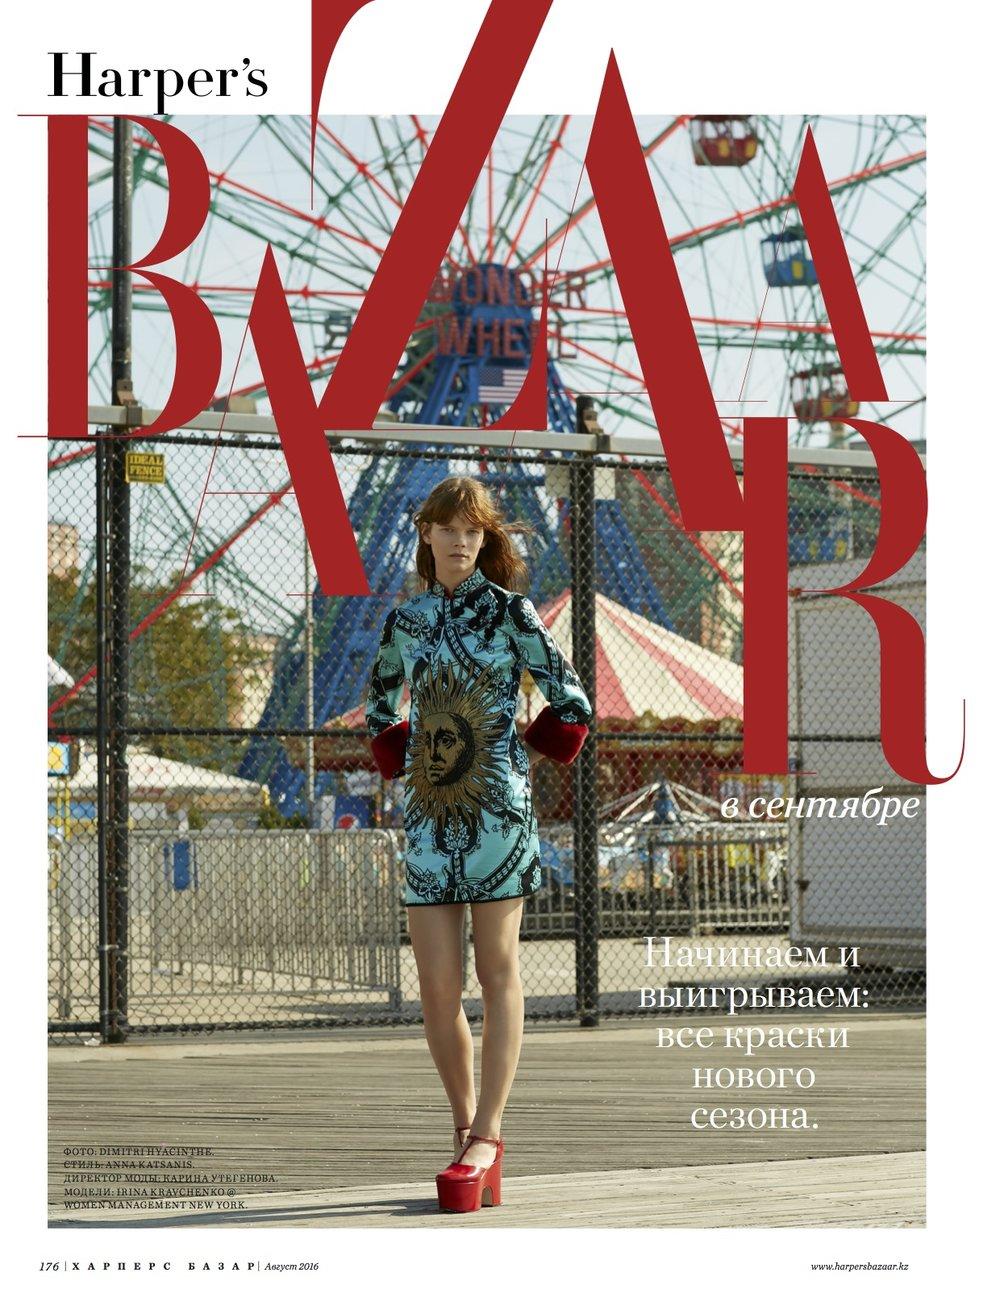 Harper's Bazaar KZ September 2016 Photography Dimitri Hyacinthe Stylist Anna Katsanis